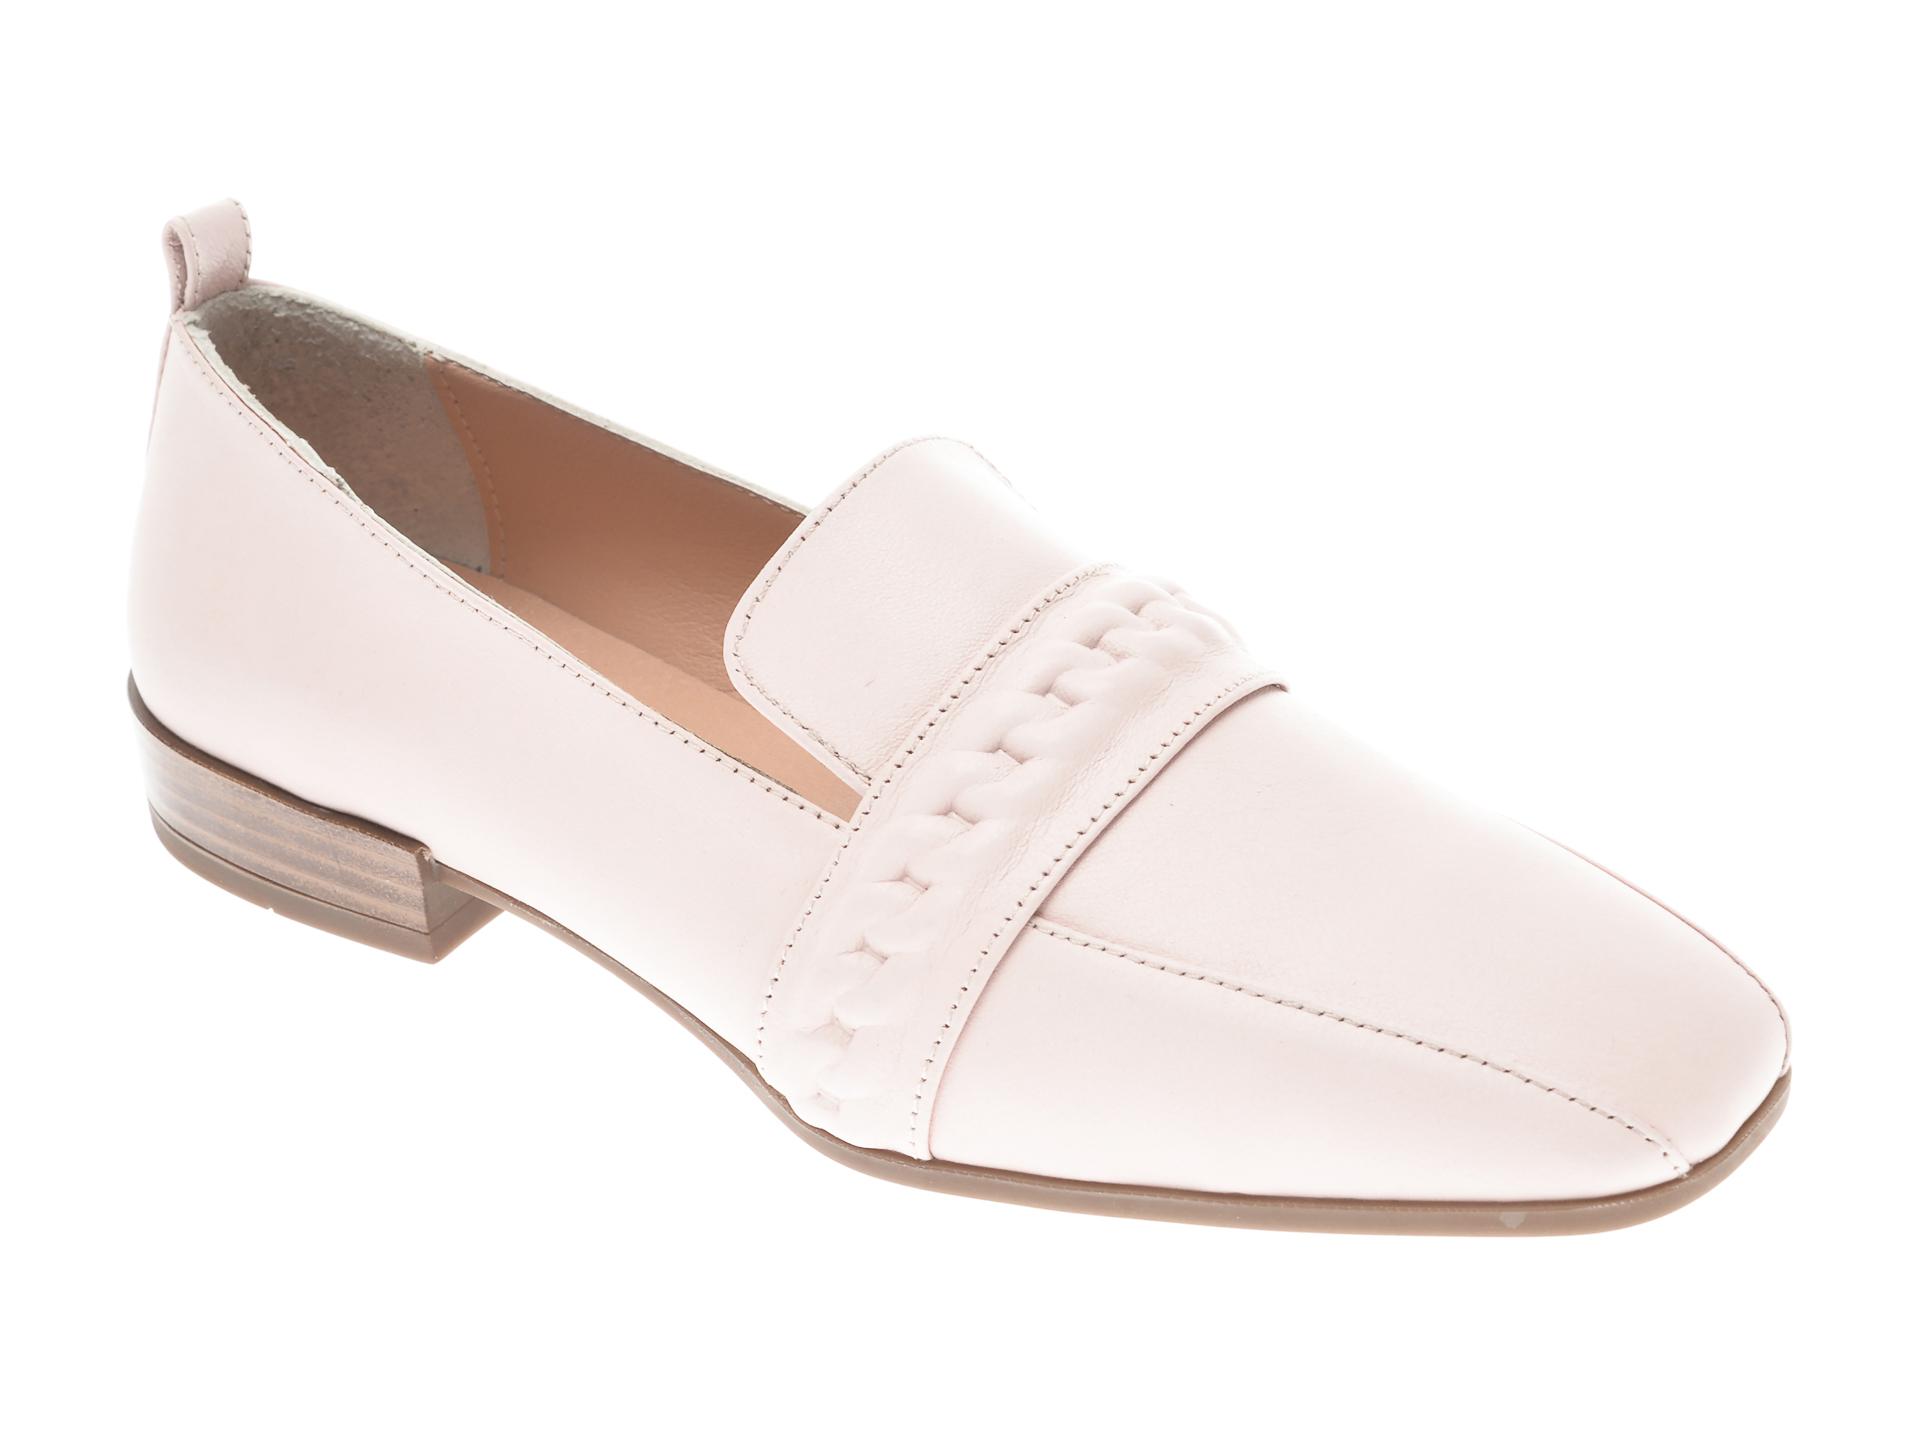 Pantofi FLAVIA PASSINI roz, 22020, din piele naturala imagine